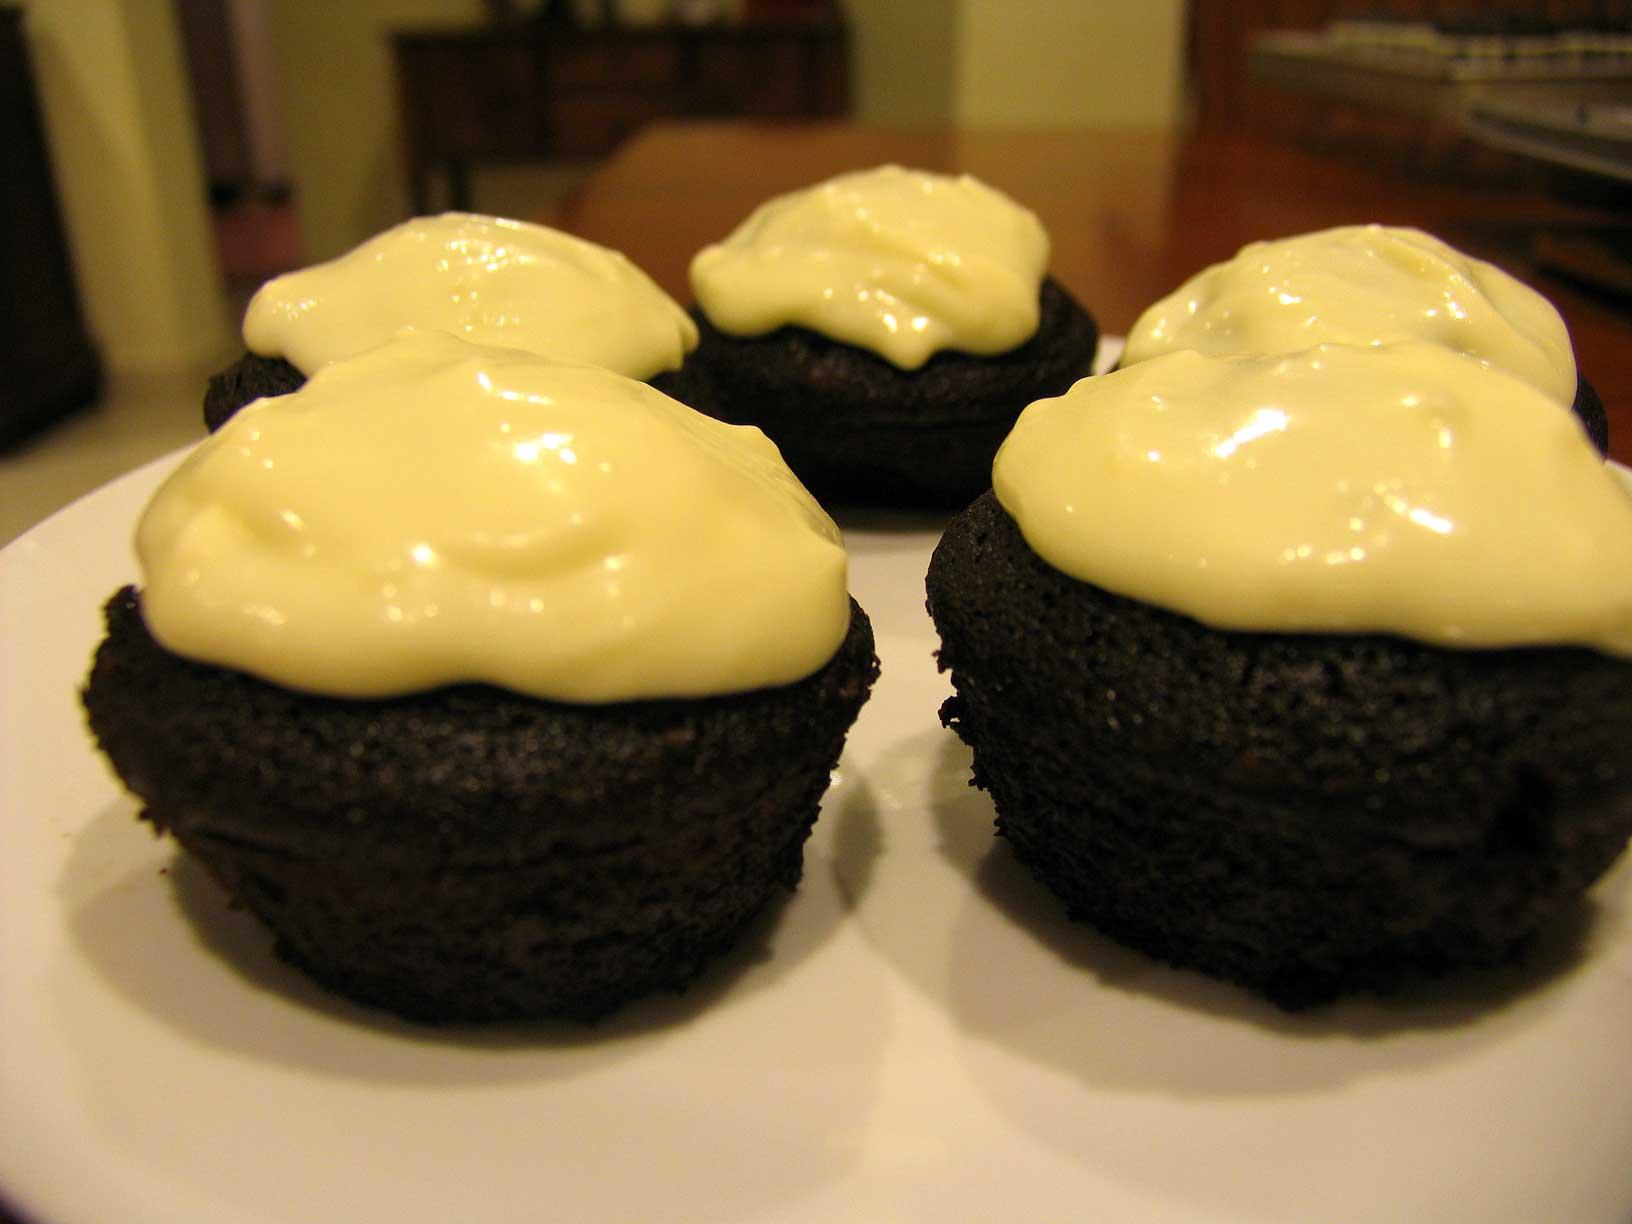 Choc Guiness Cupcakes